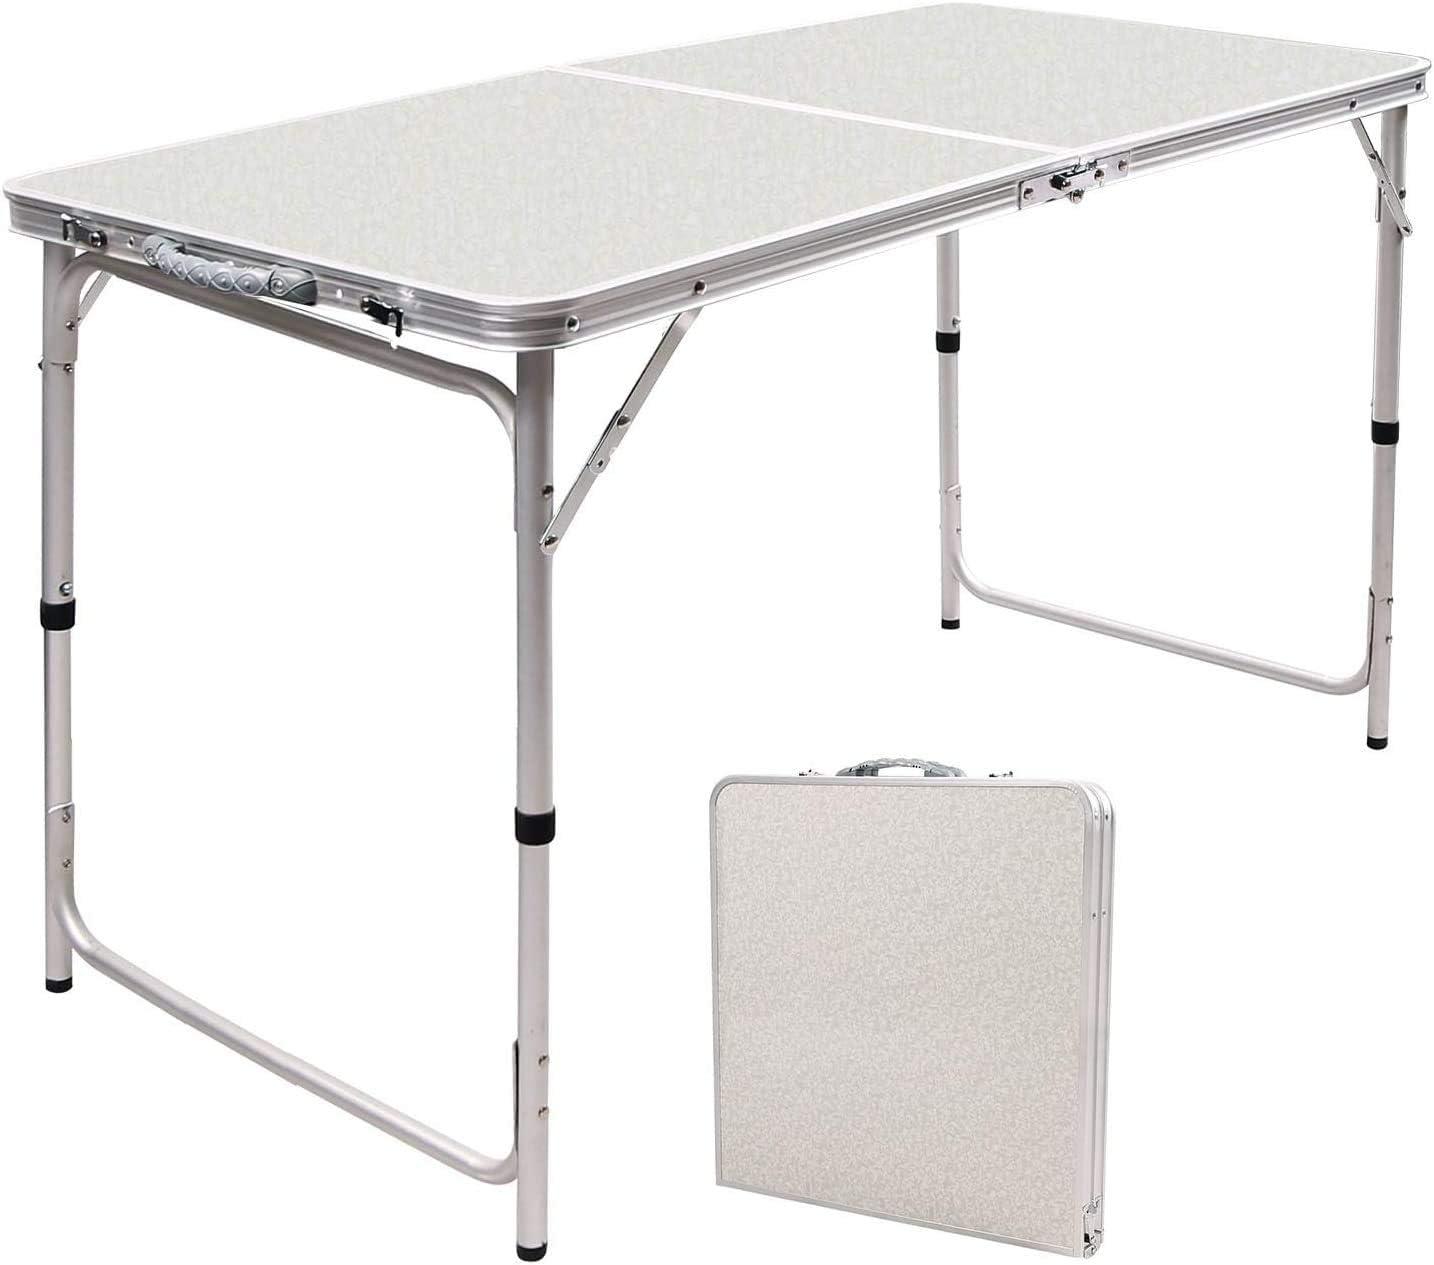 - Amazon.com: RedSwing 4 Feet Folding Table Adjustable Height